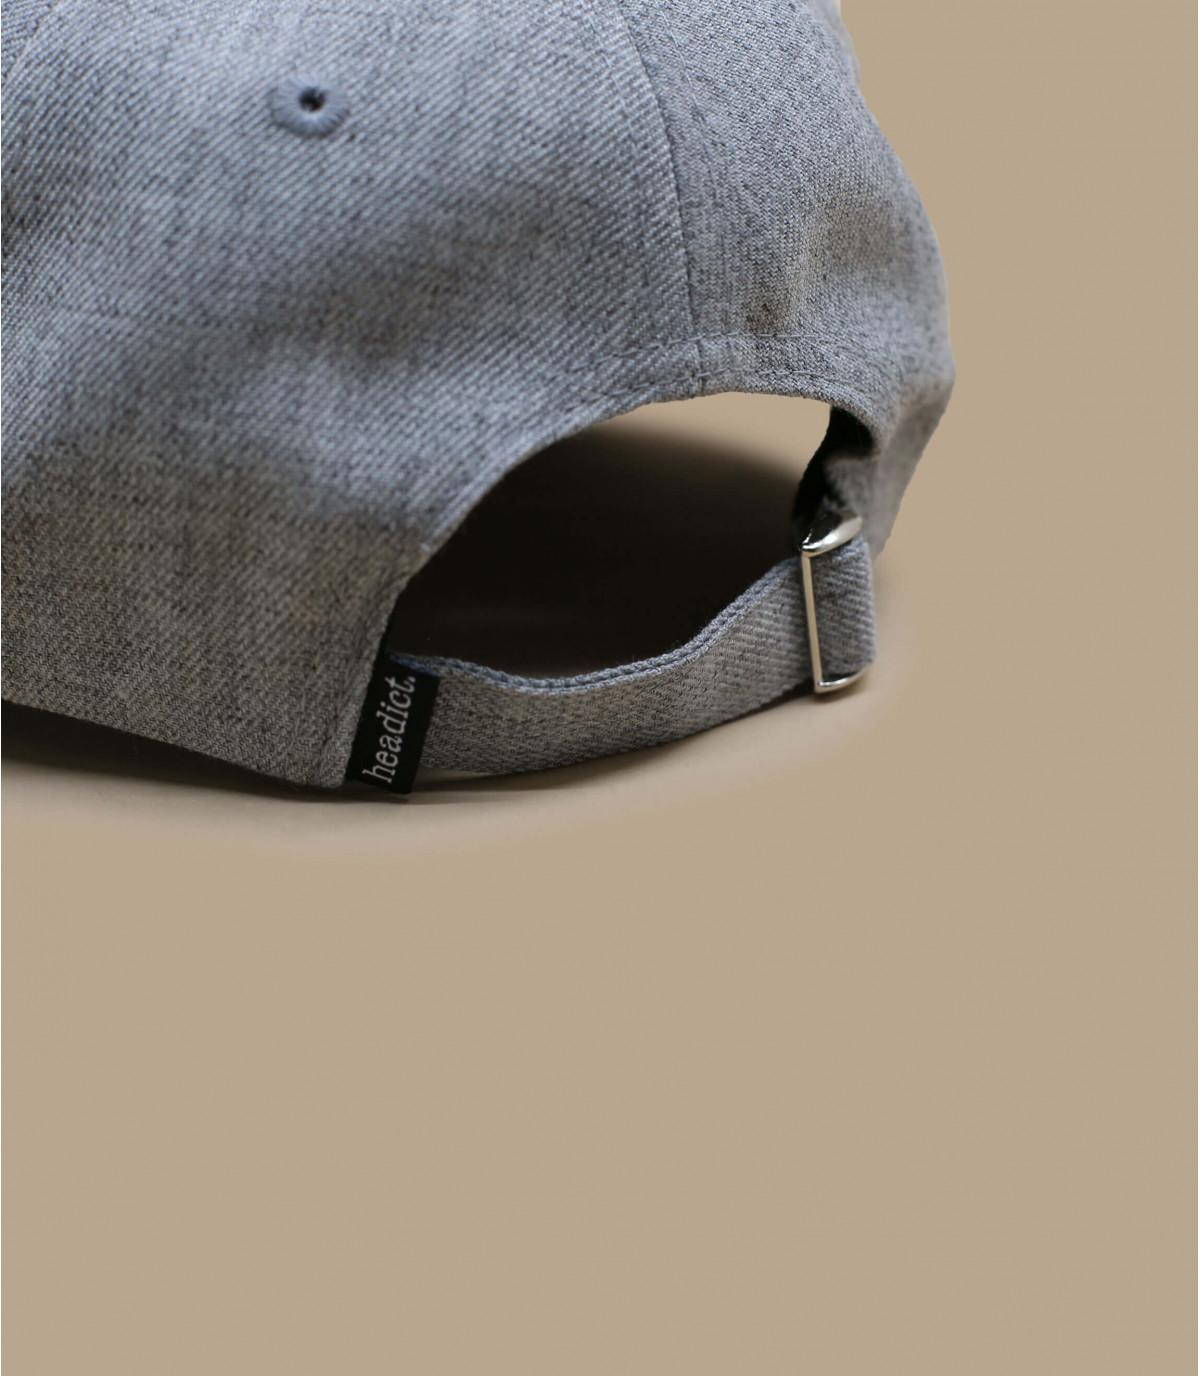 Dettagli Curve Life Is Better grey black - image 3